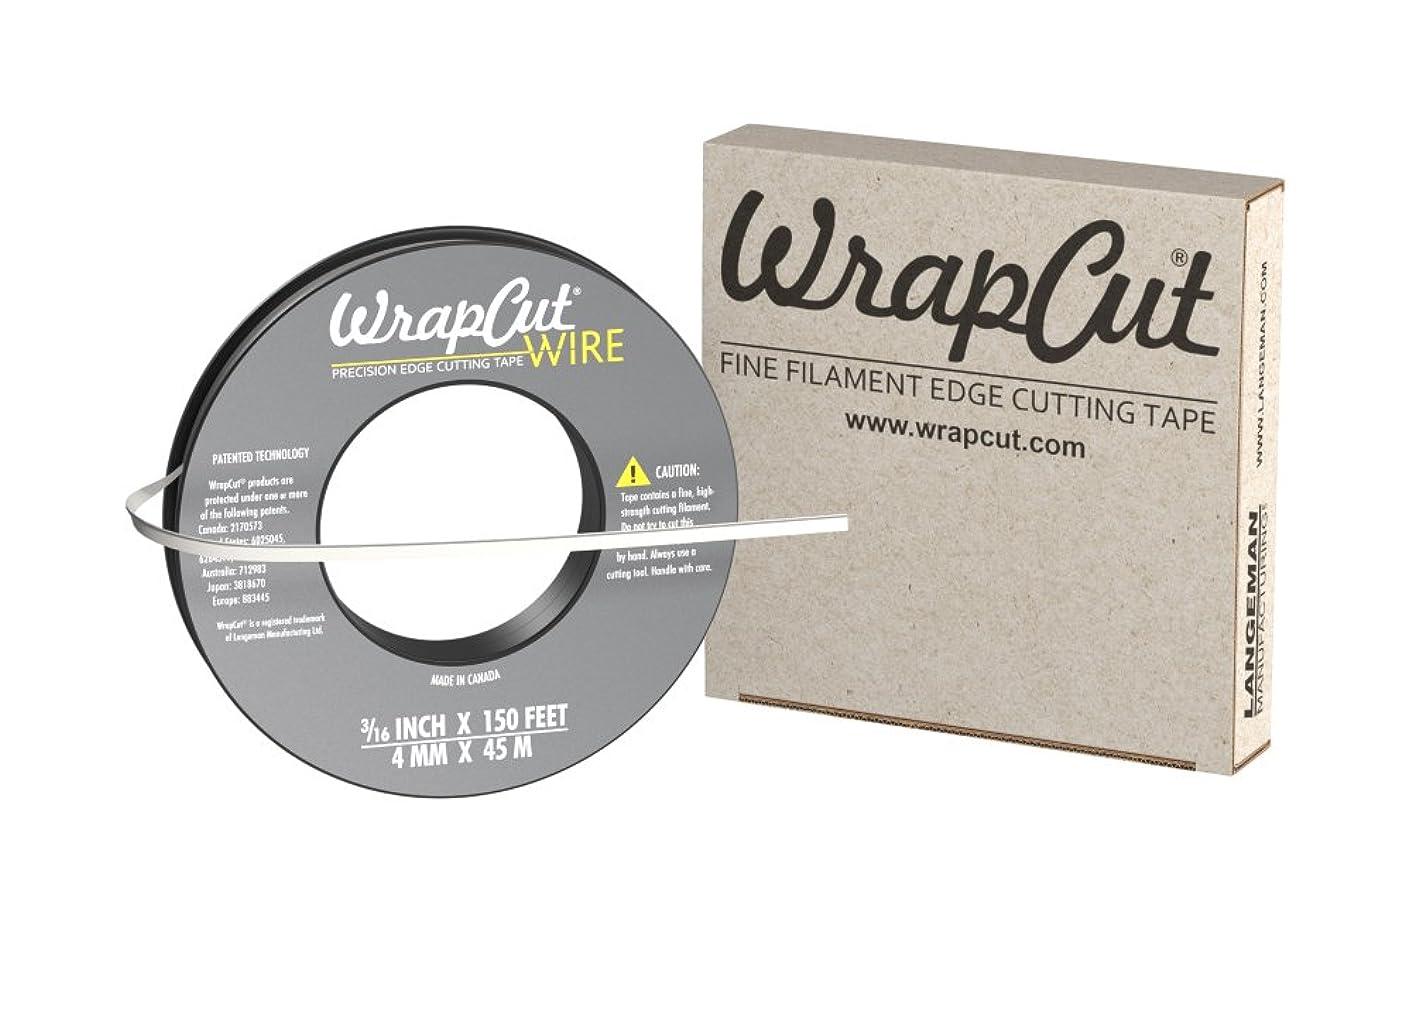 WrapCut Wire, Edge Cutting Tape, 3/16-Inch X 150 Feet, 1 Roll lrpexvhw44630009